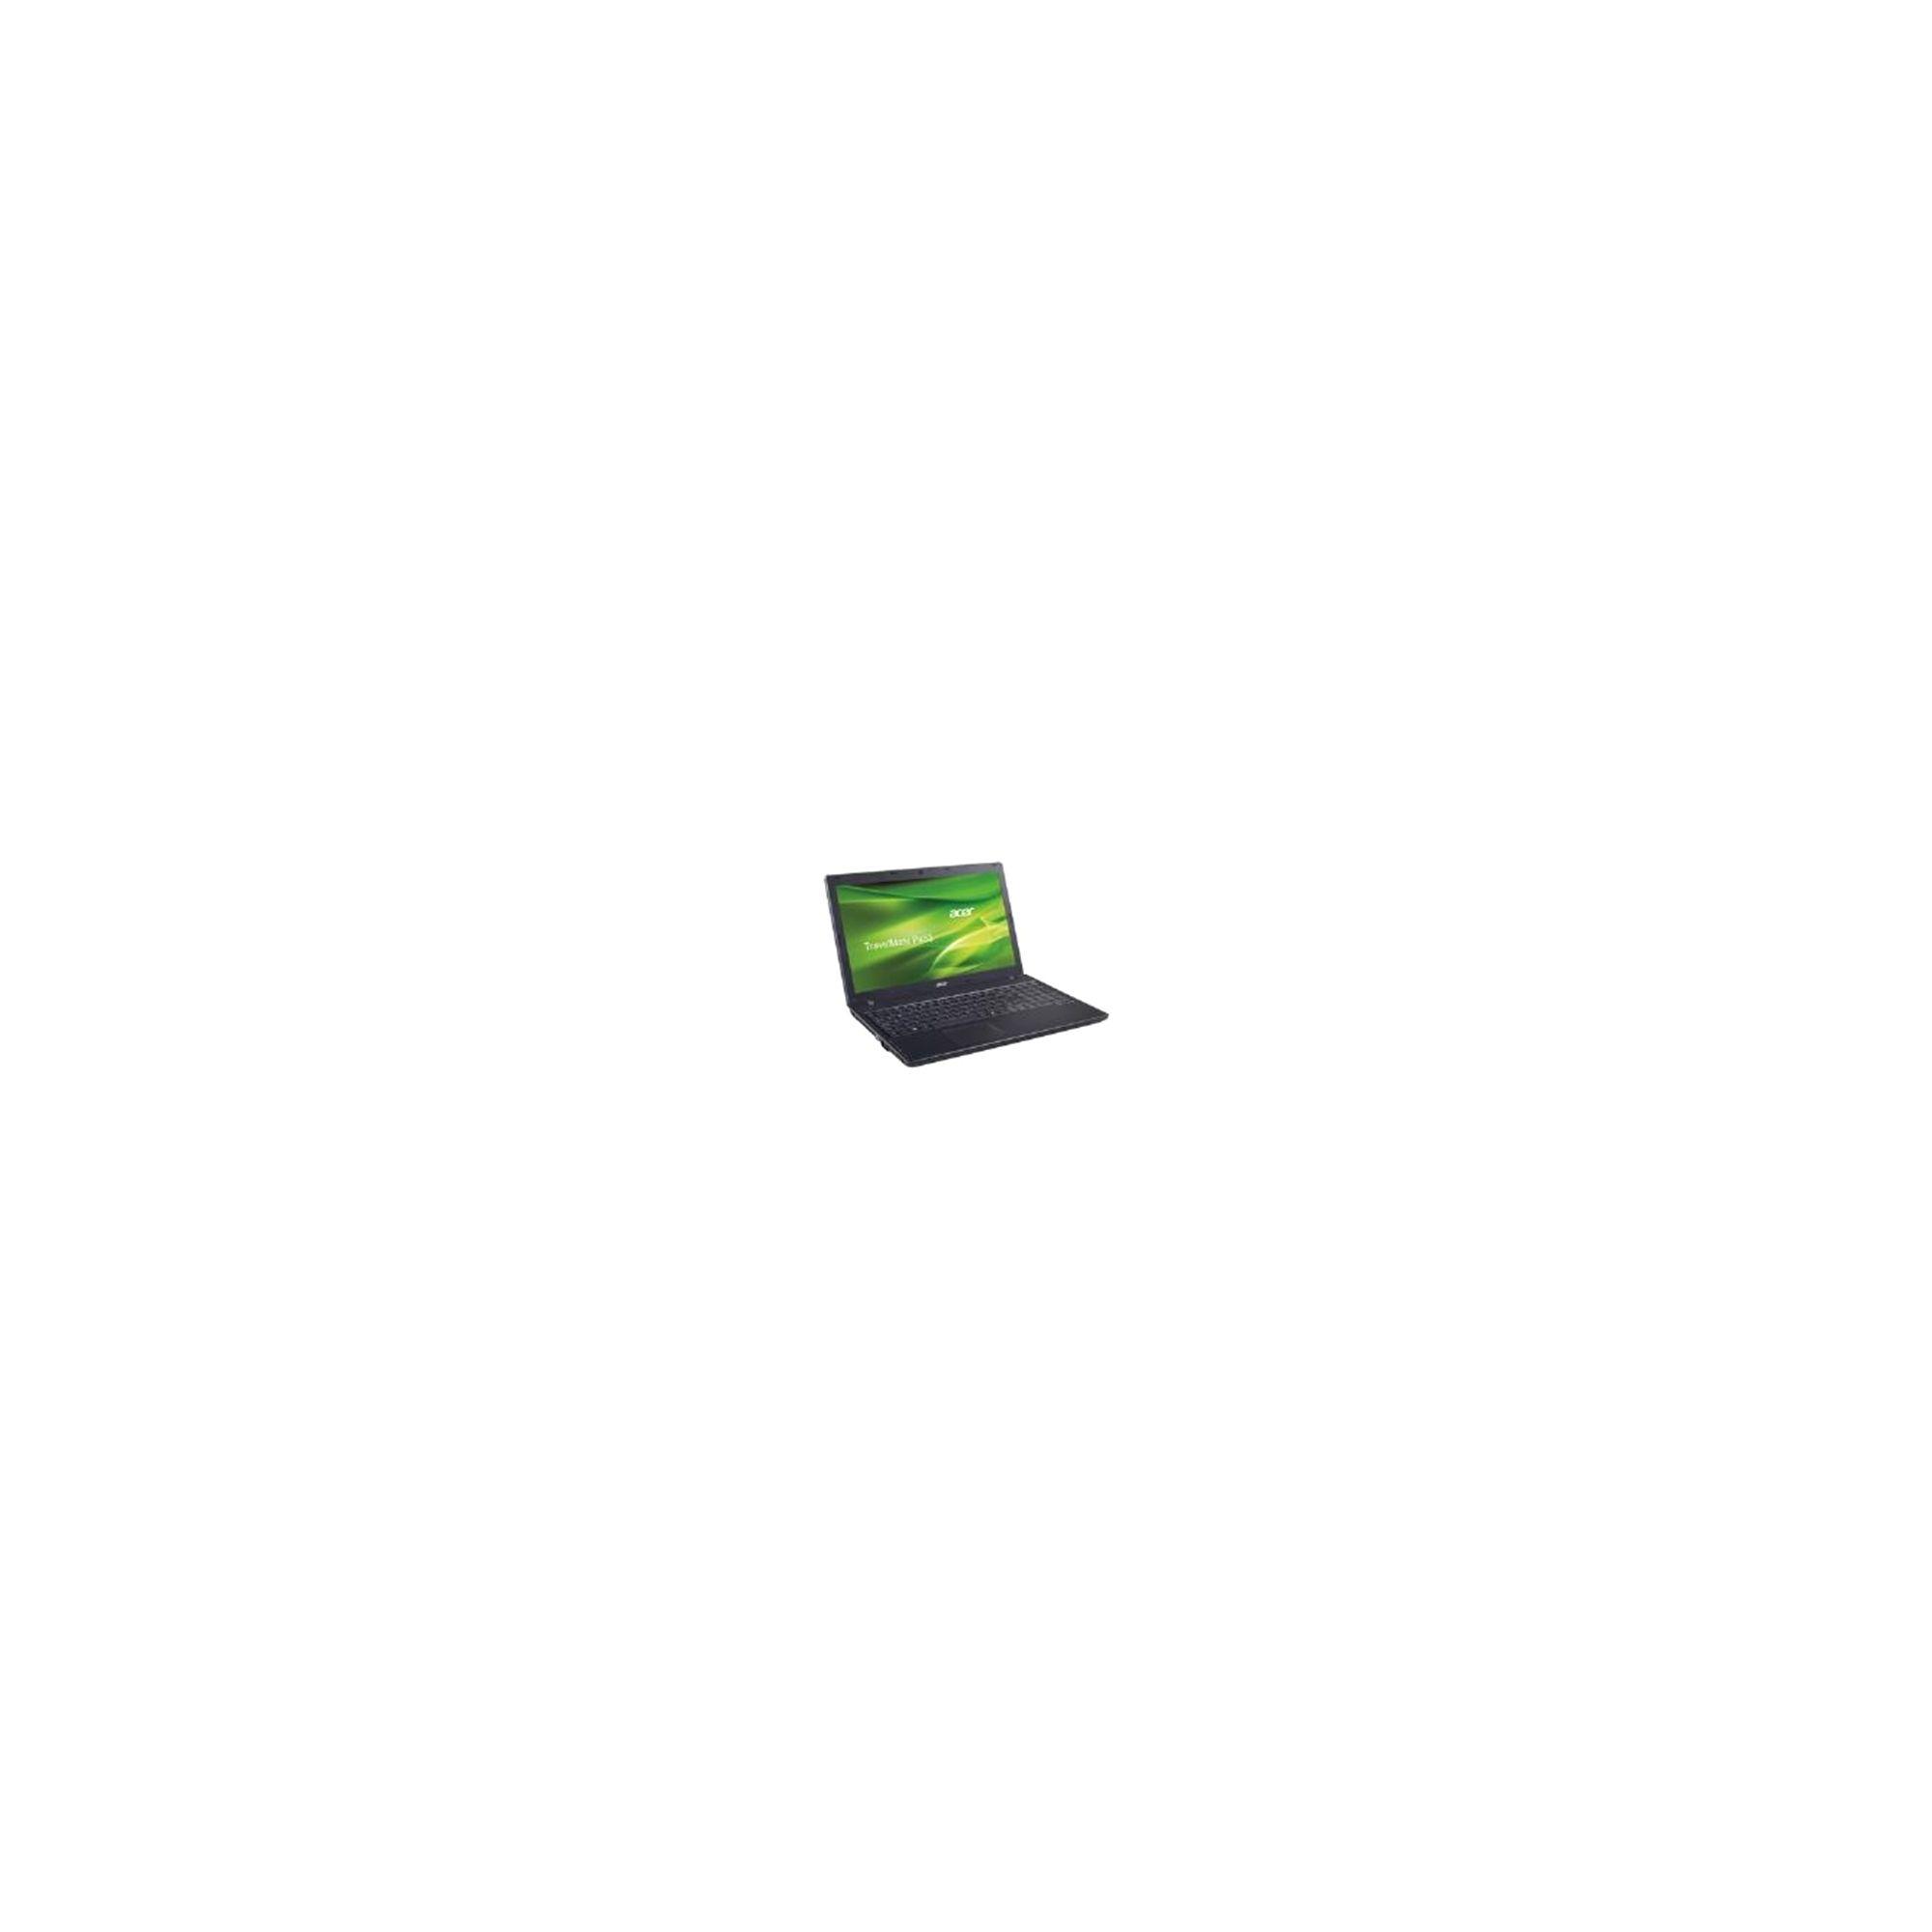 Acer TravelMate P453-M-53214G50Makk (15.6 inch) Notebook Core i5 (3210M) 2.5GHz 4GB 500GB WLAN BT Webcam Windows 7 Pro 64-bit/Windows 8 Pro 64-bit at Tesco Direct